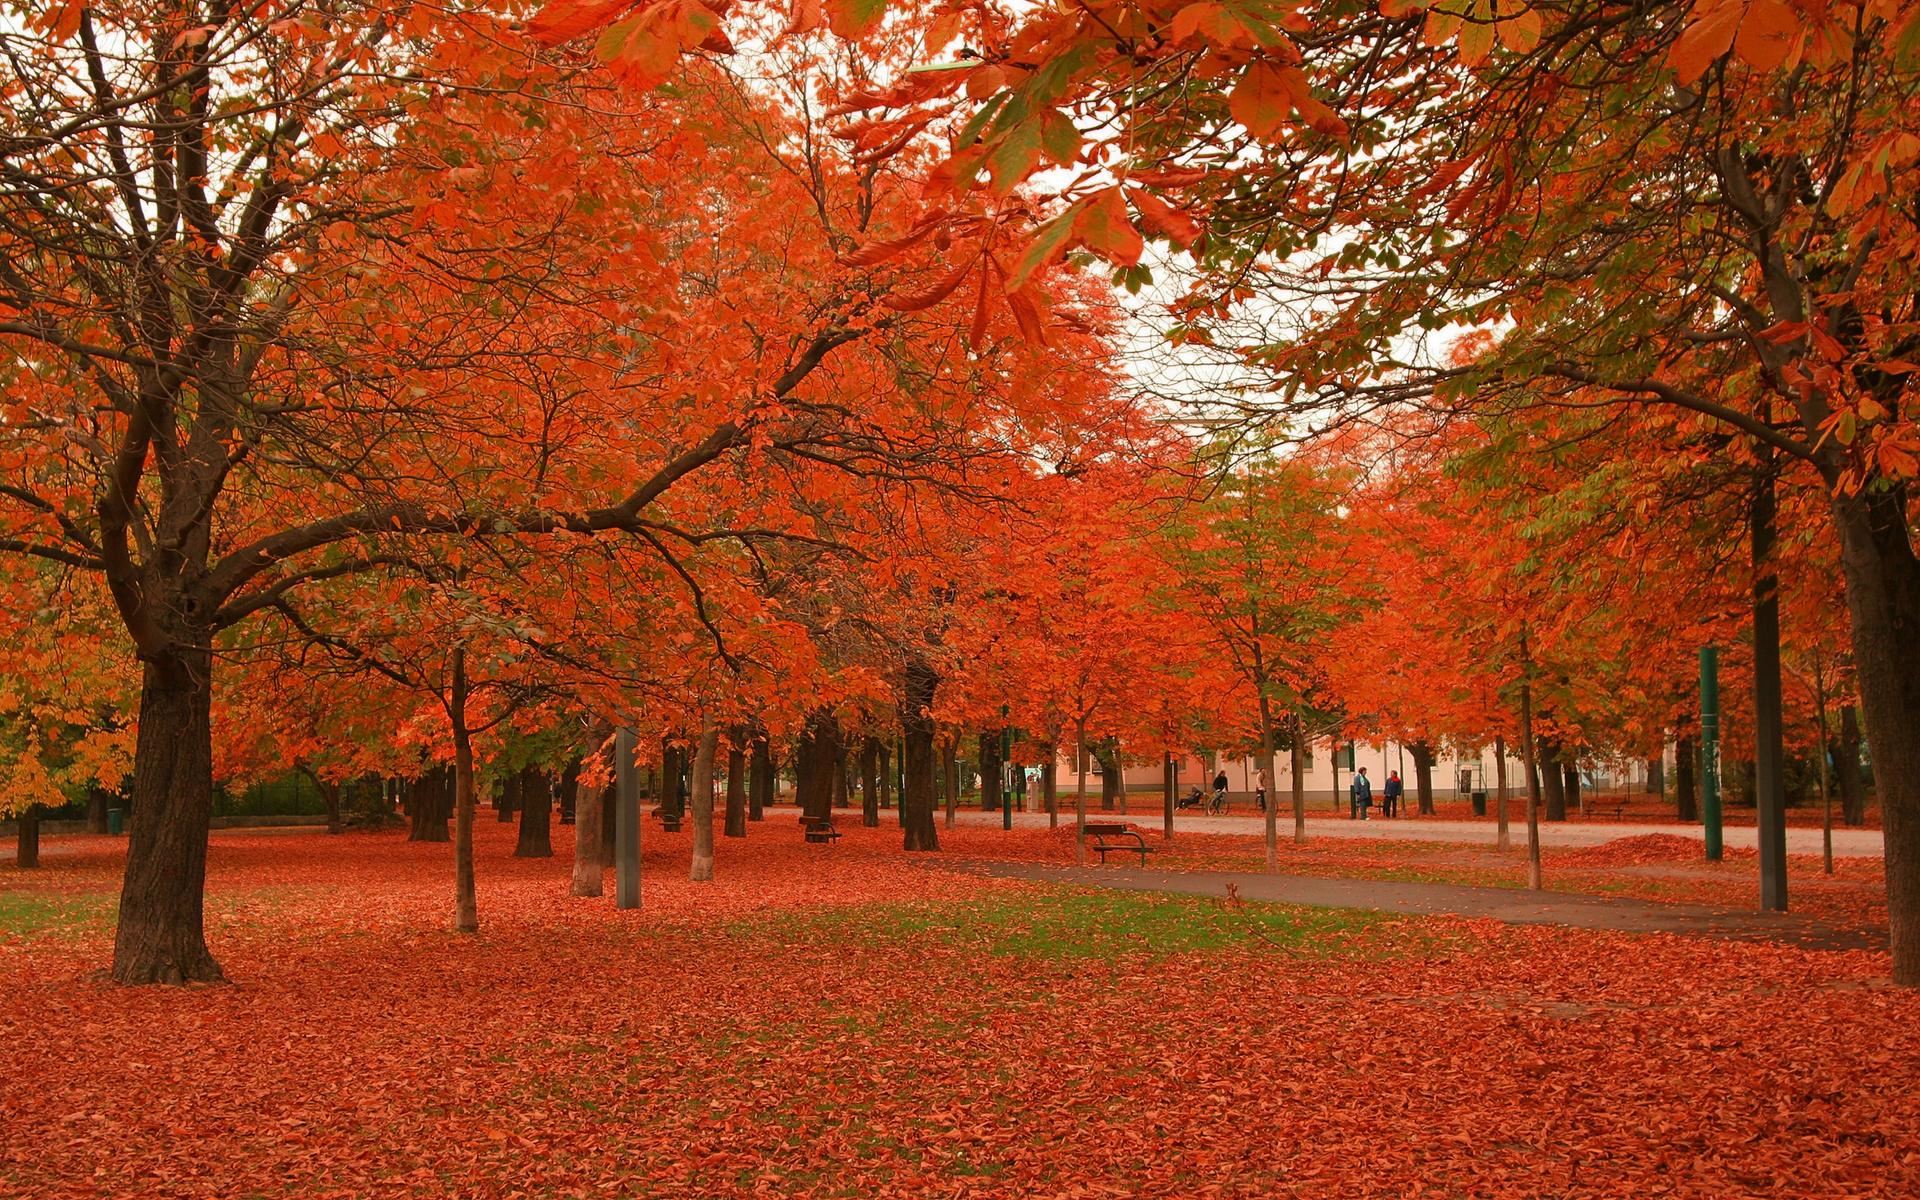 پارک نارنجی